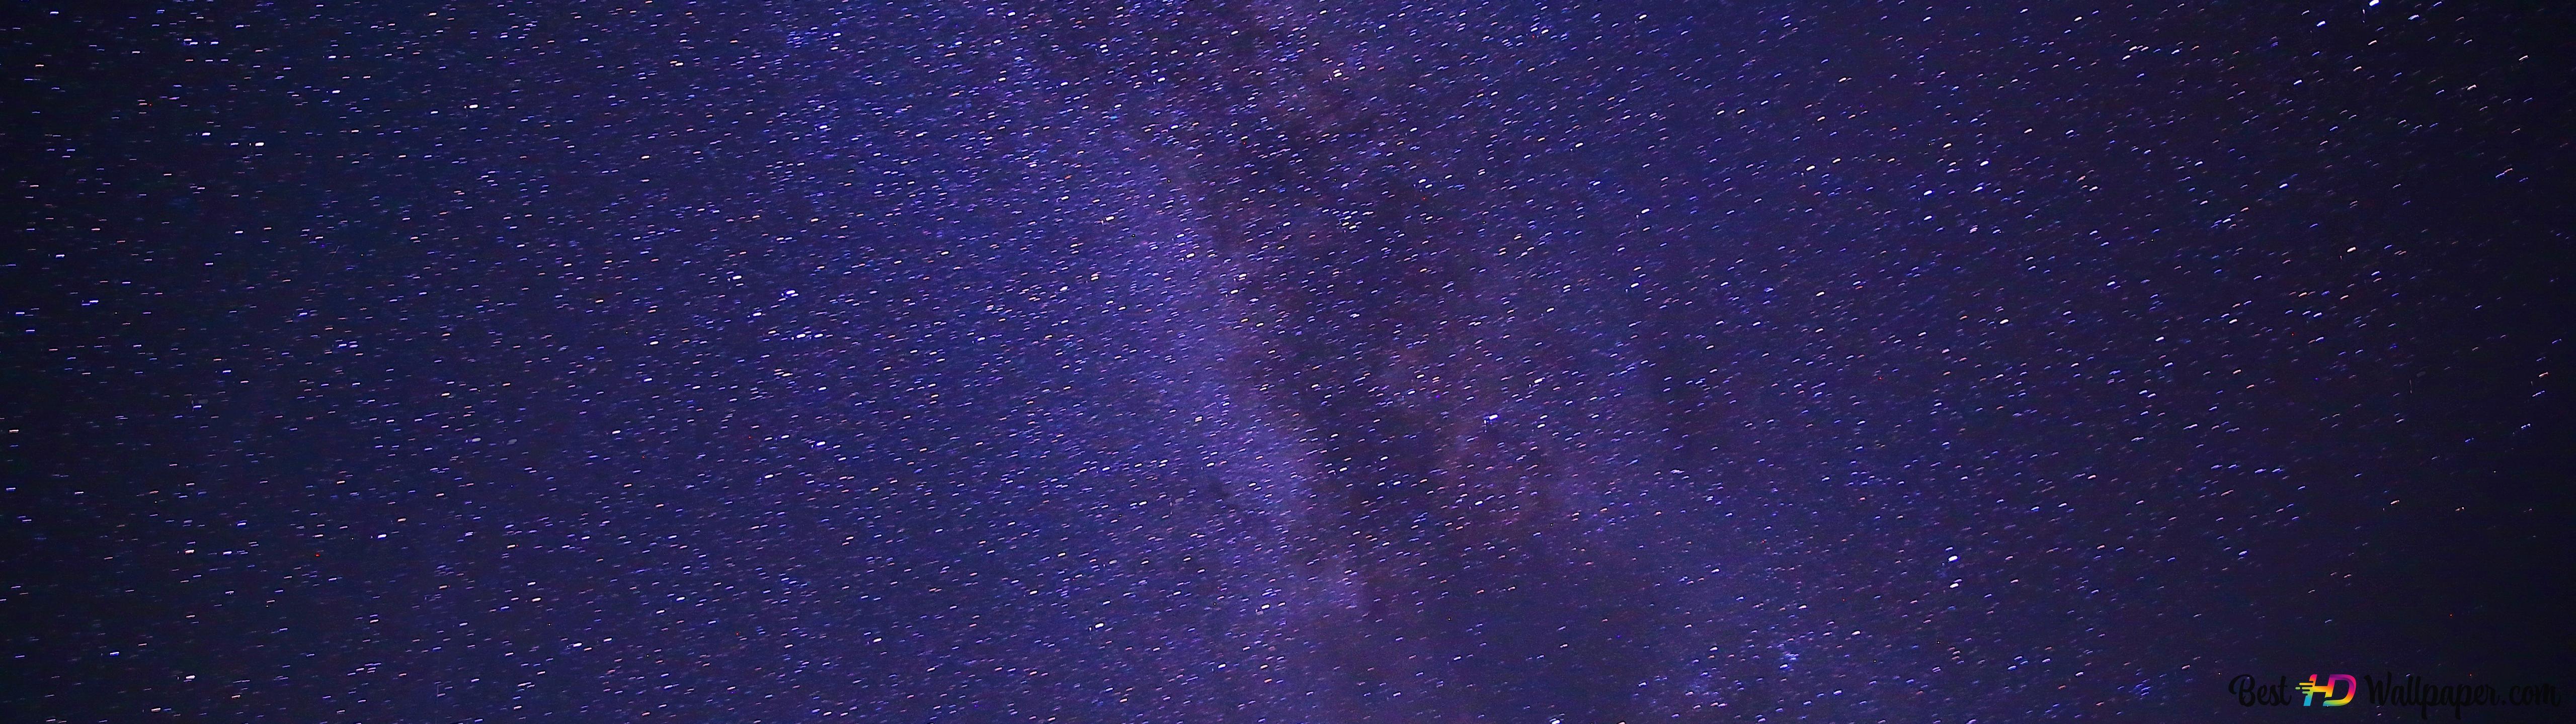 Billions Stars In The Night Sky Hd Wallpaper Download